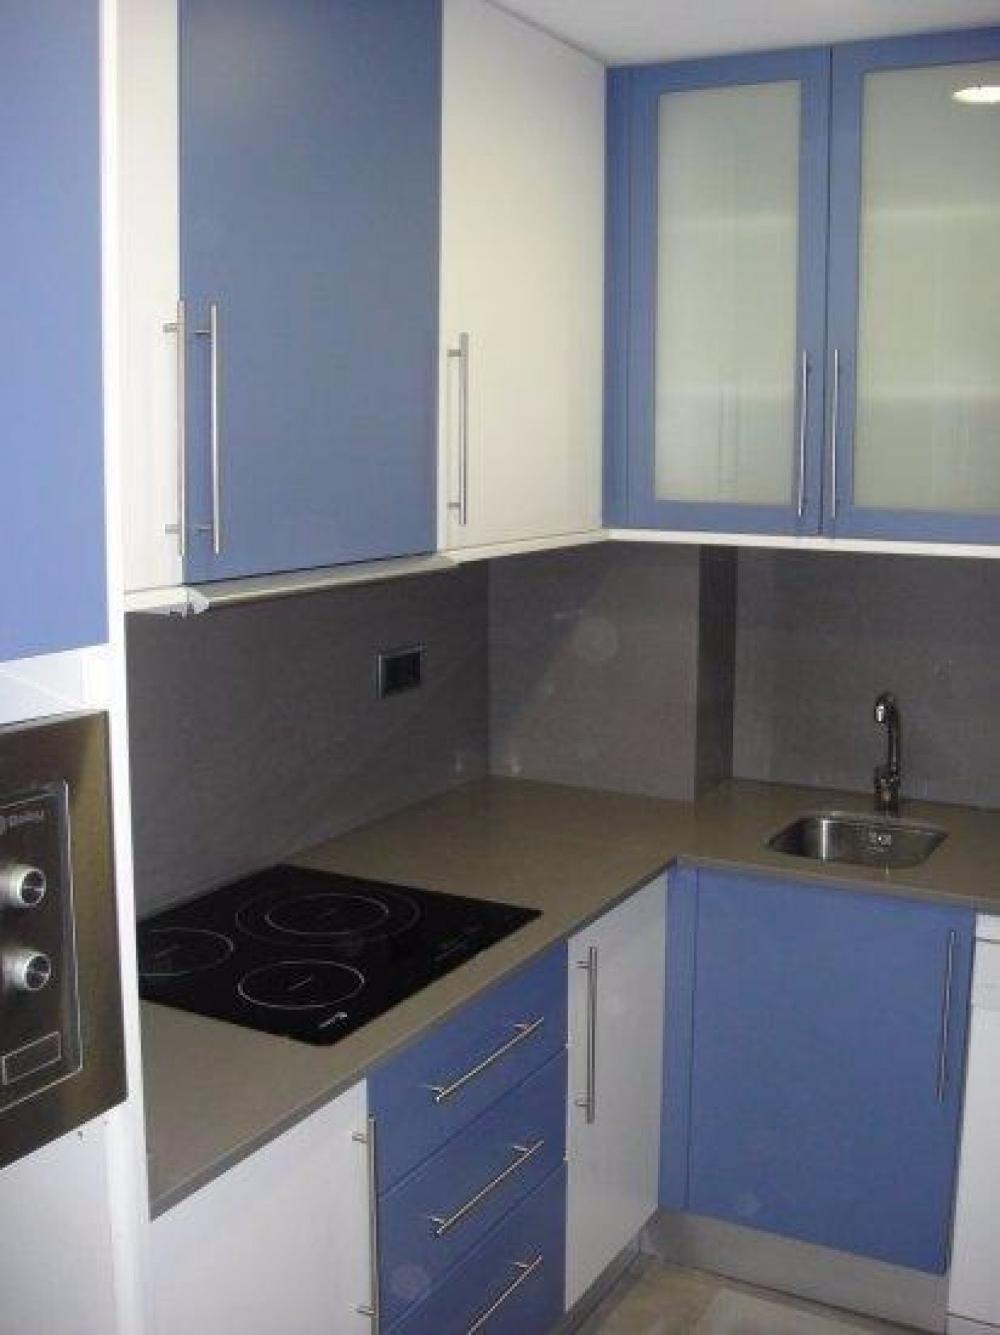 canillo andorra appartement photo 3050426